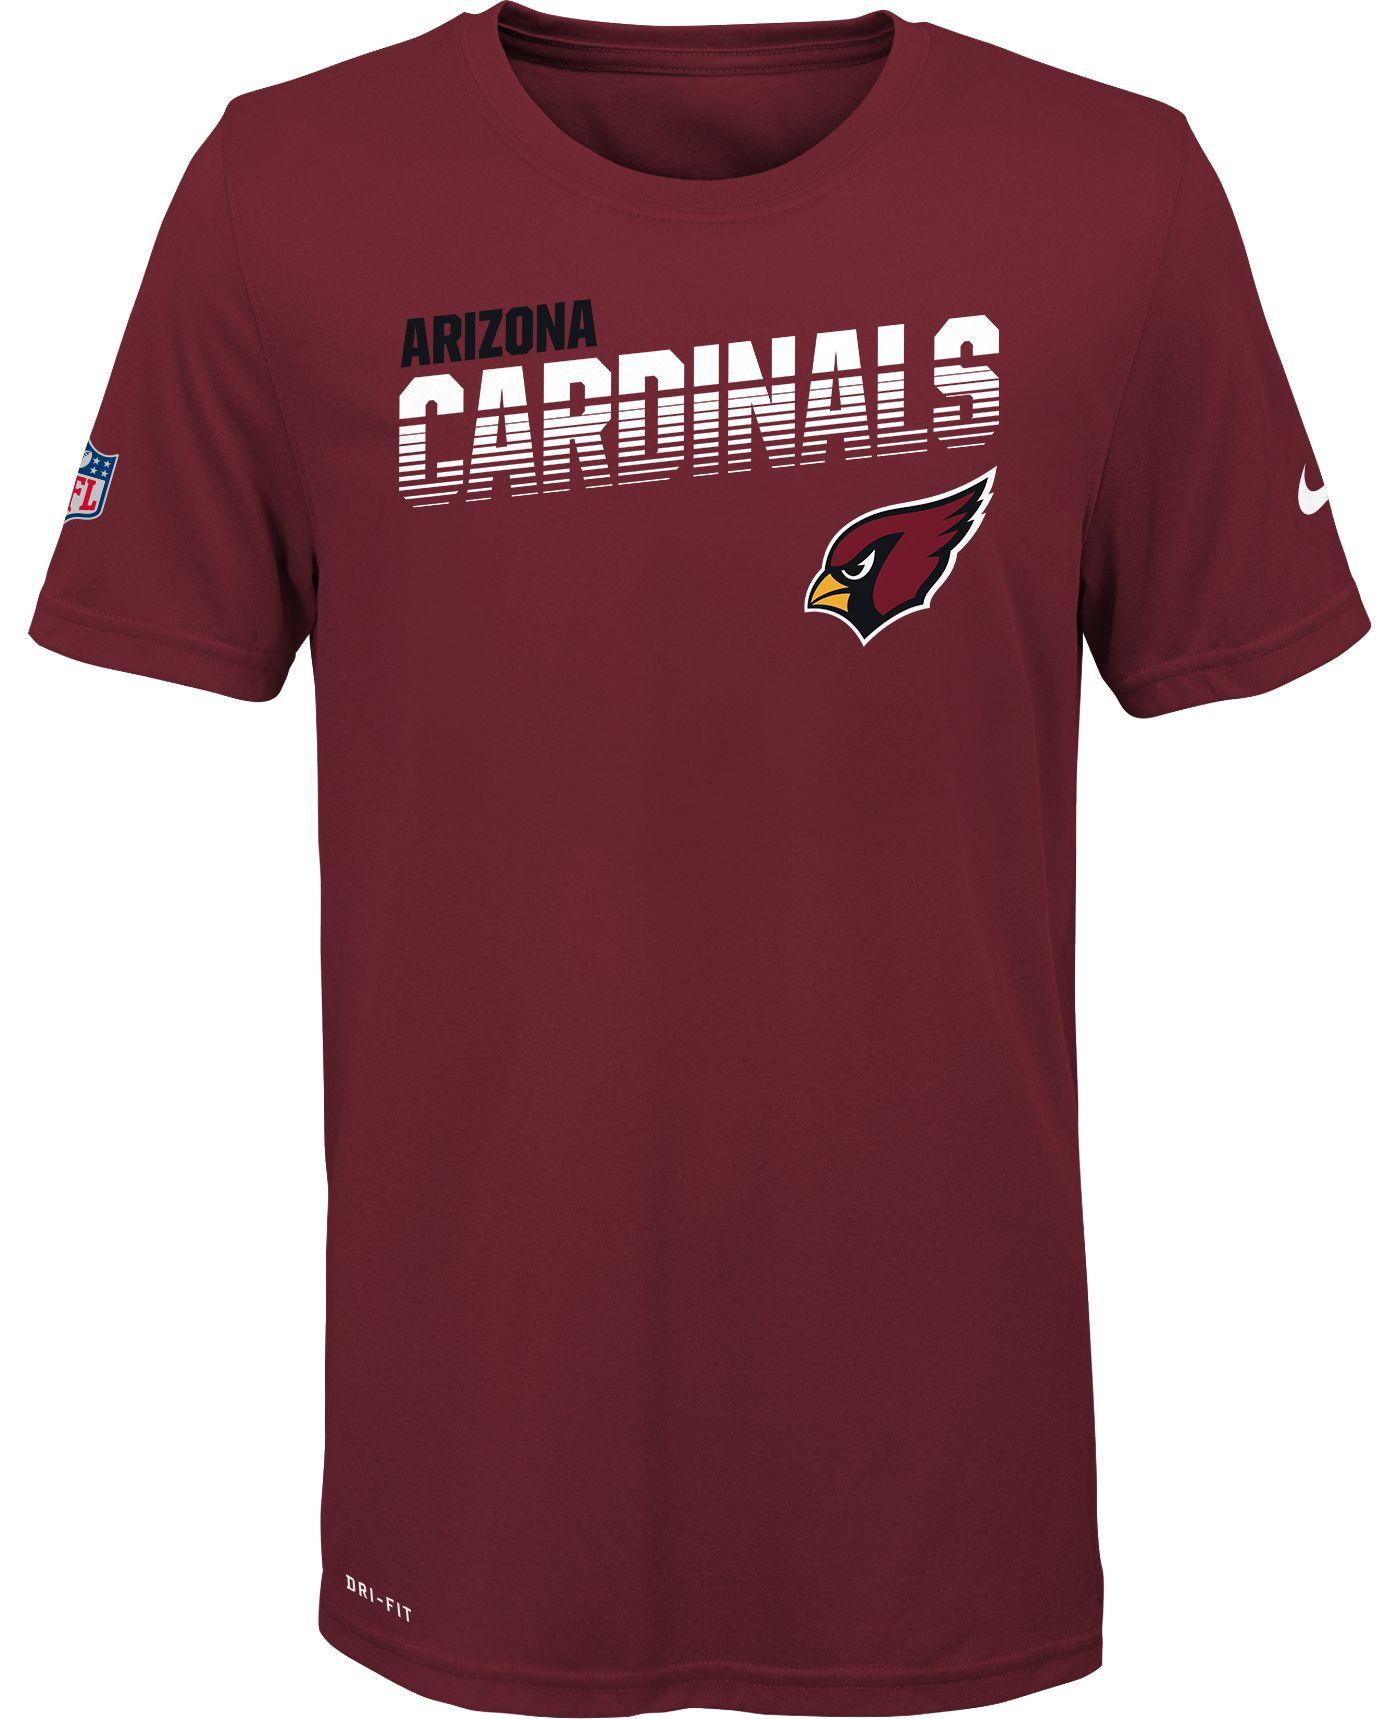 Nike Youth Arizona Cardinals Sideline Legend Performance Red T-Shirt